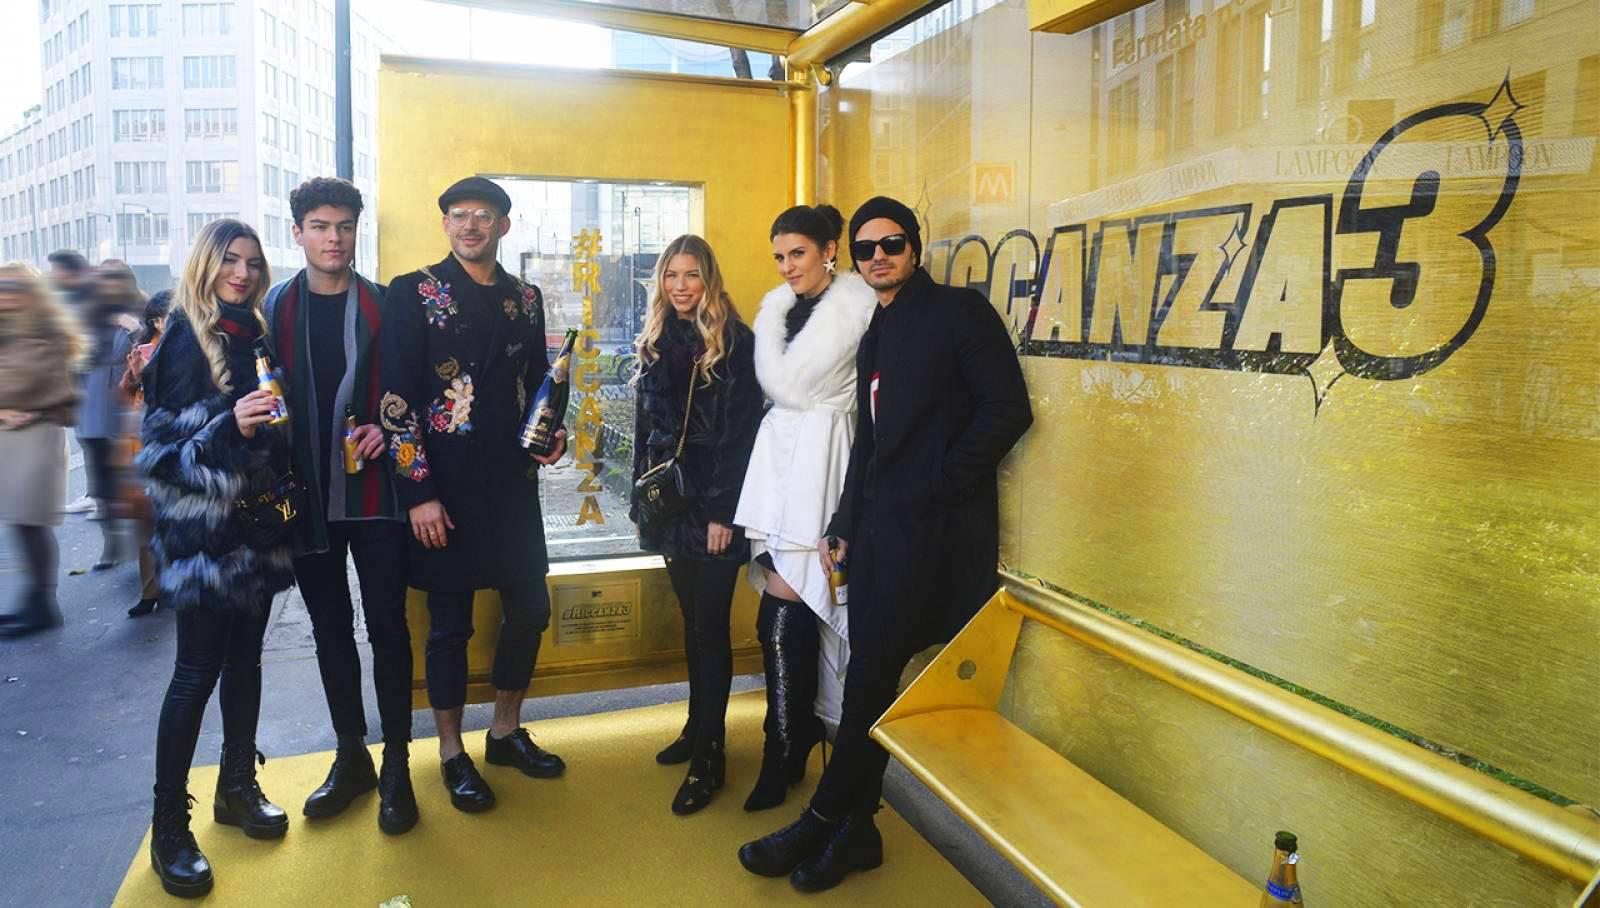 OOH IGPDecaux Milano brand pensilina per Riccanza MTV